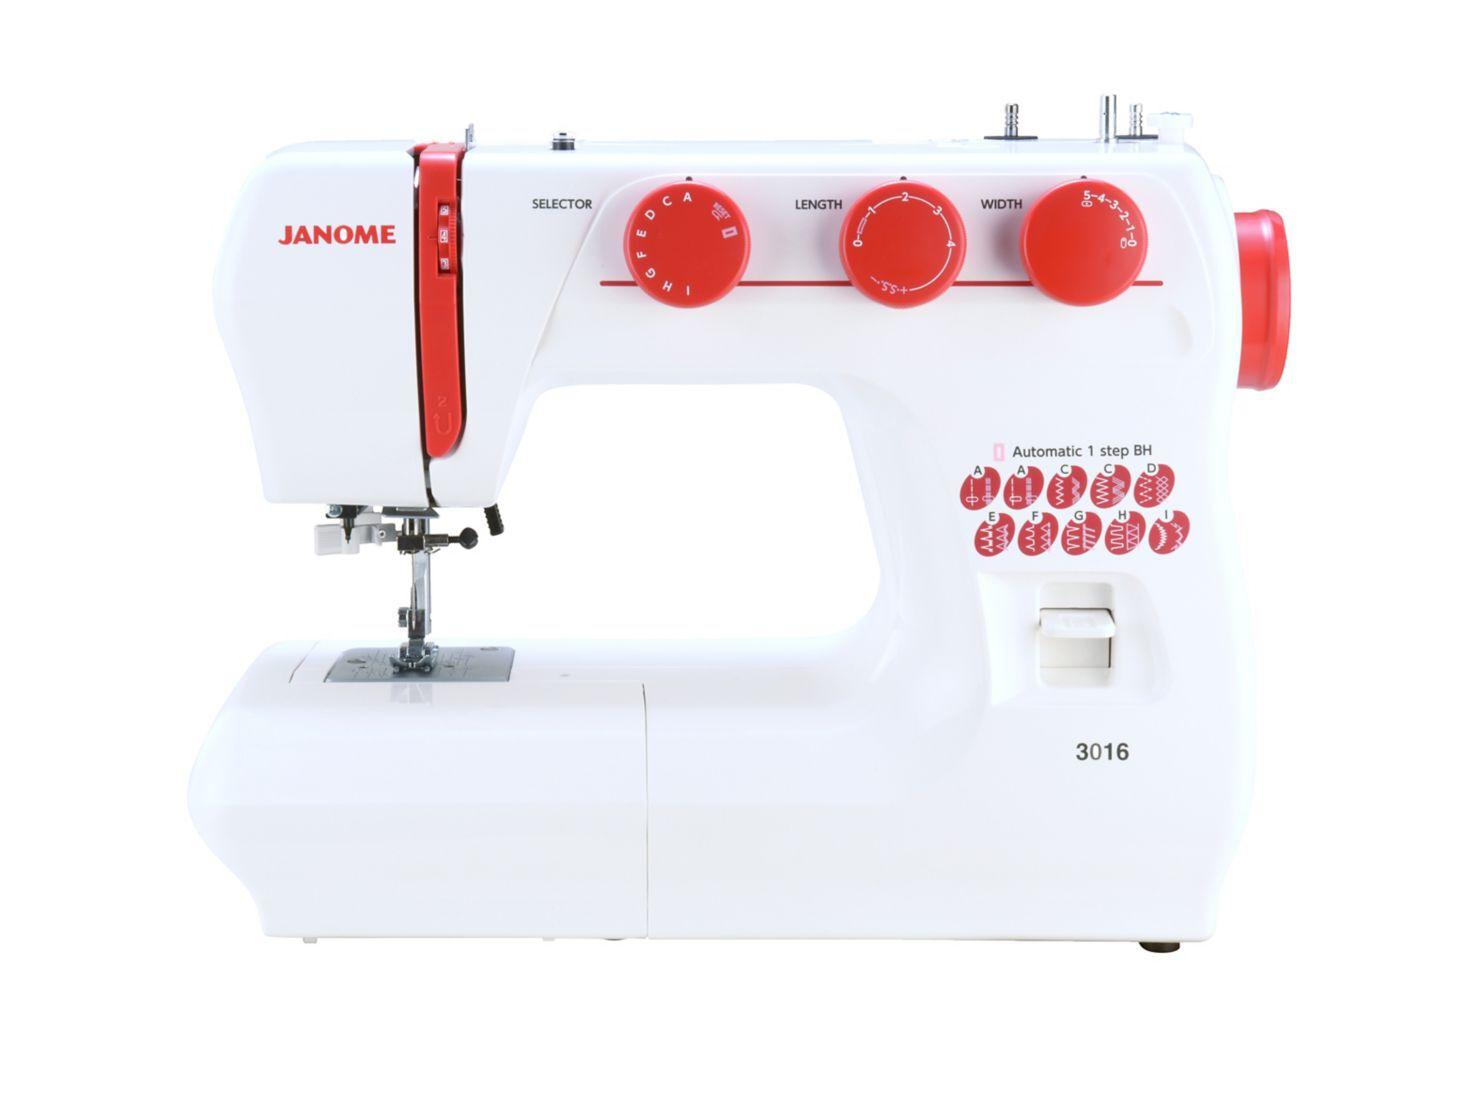 Máquina de coser Janome 3016 - Máquinas Tradicionales | Paris